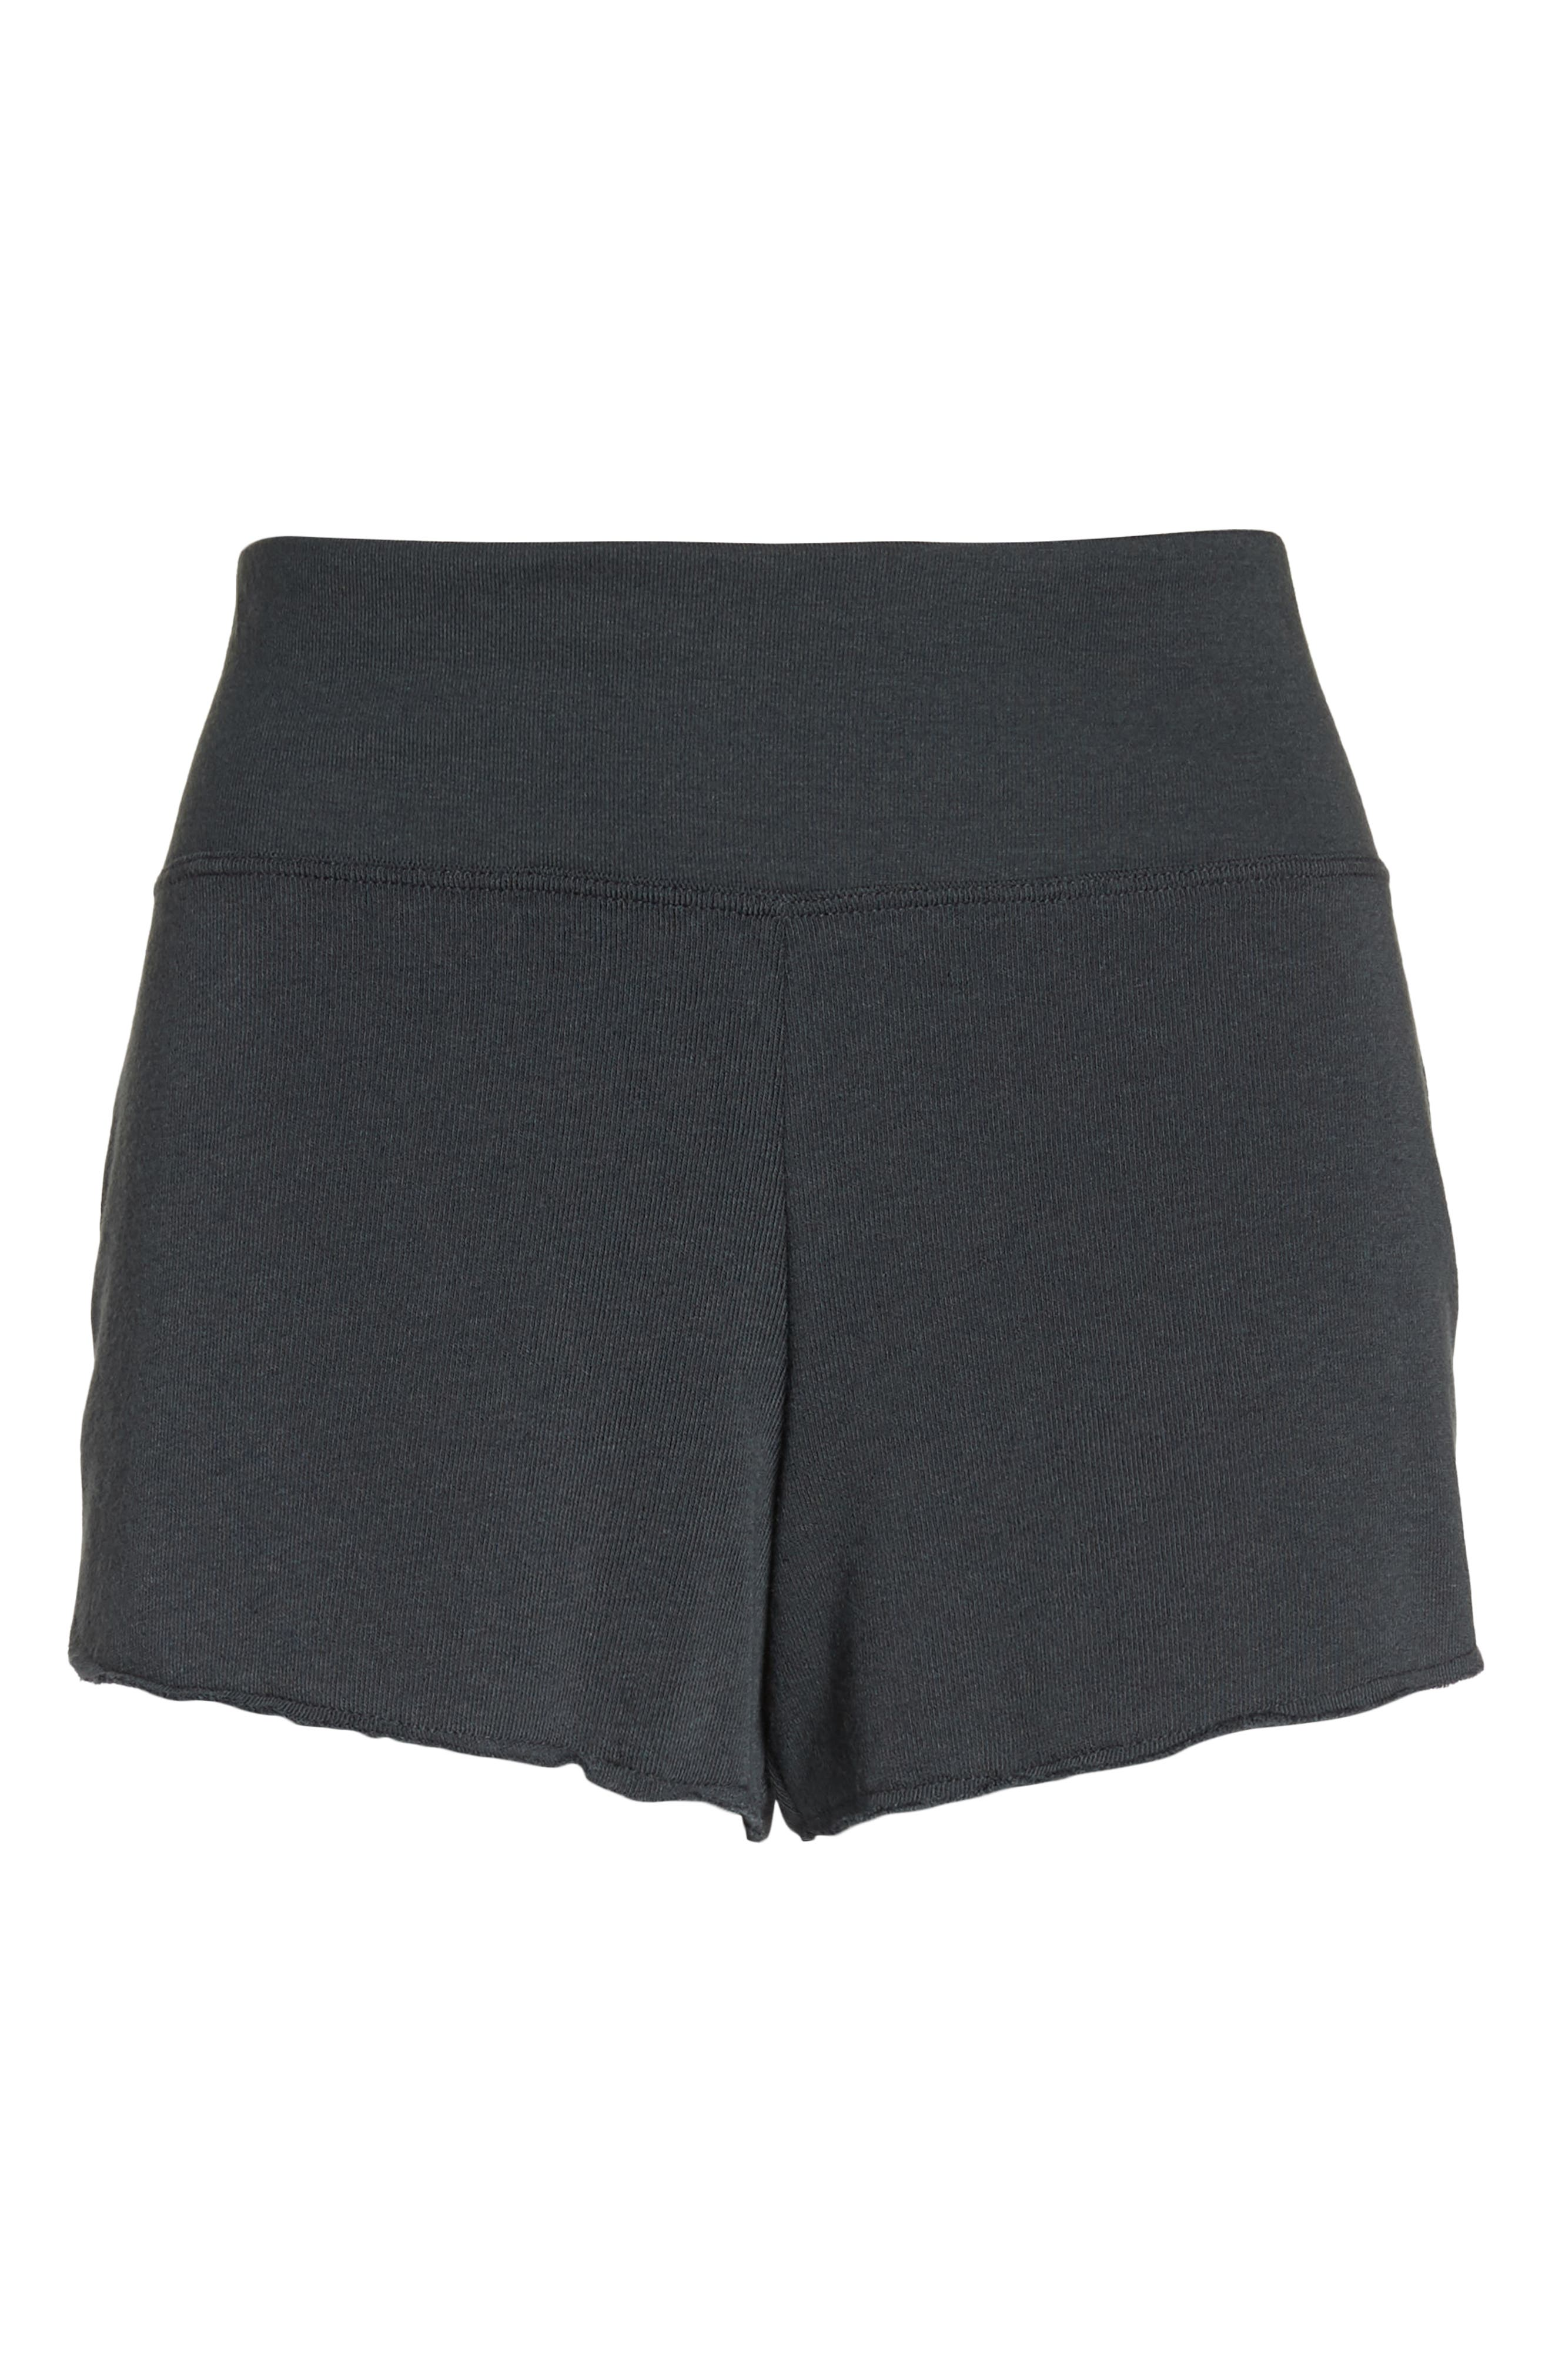 Boarder Shorts,                             Alternate thumbnail 13, color,